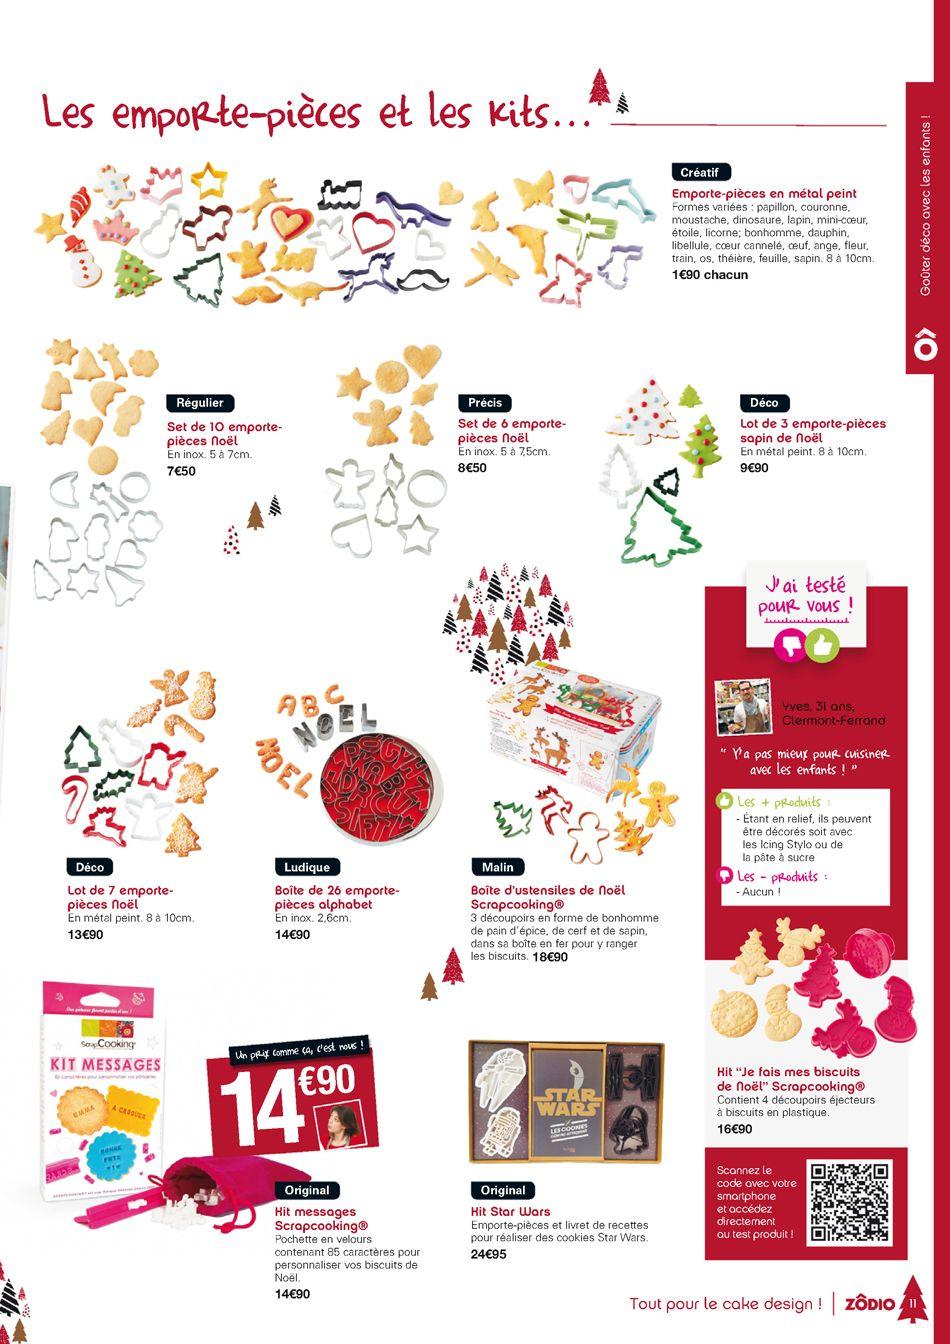 Zodio Magazine Interactif Special Cuisiner Recevoir Zodio Cuisine Decoration Creative